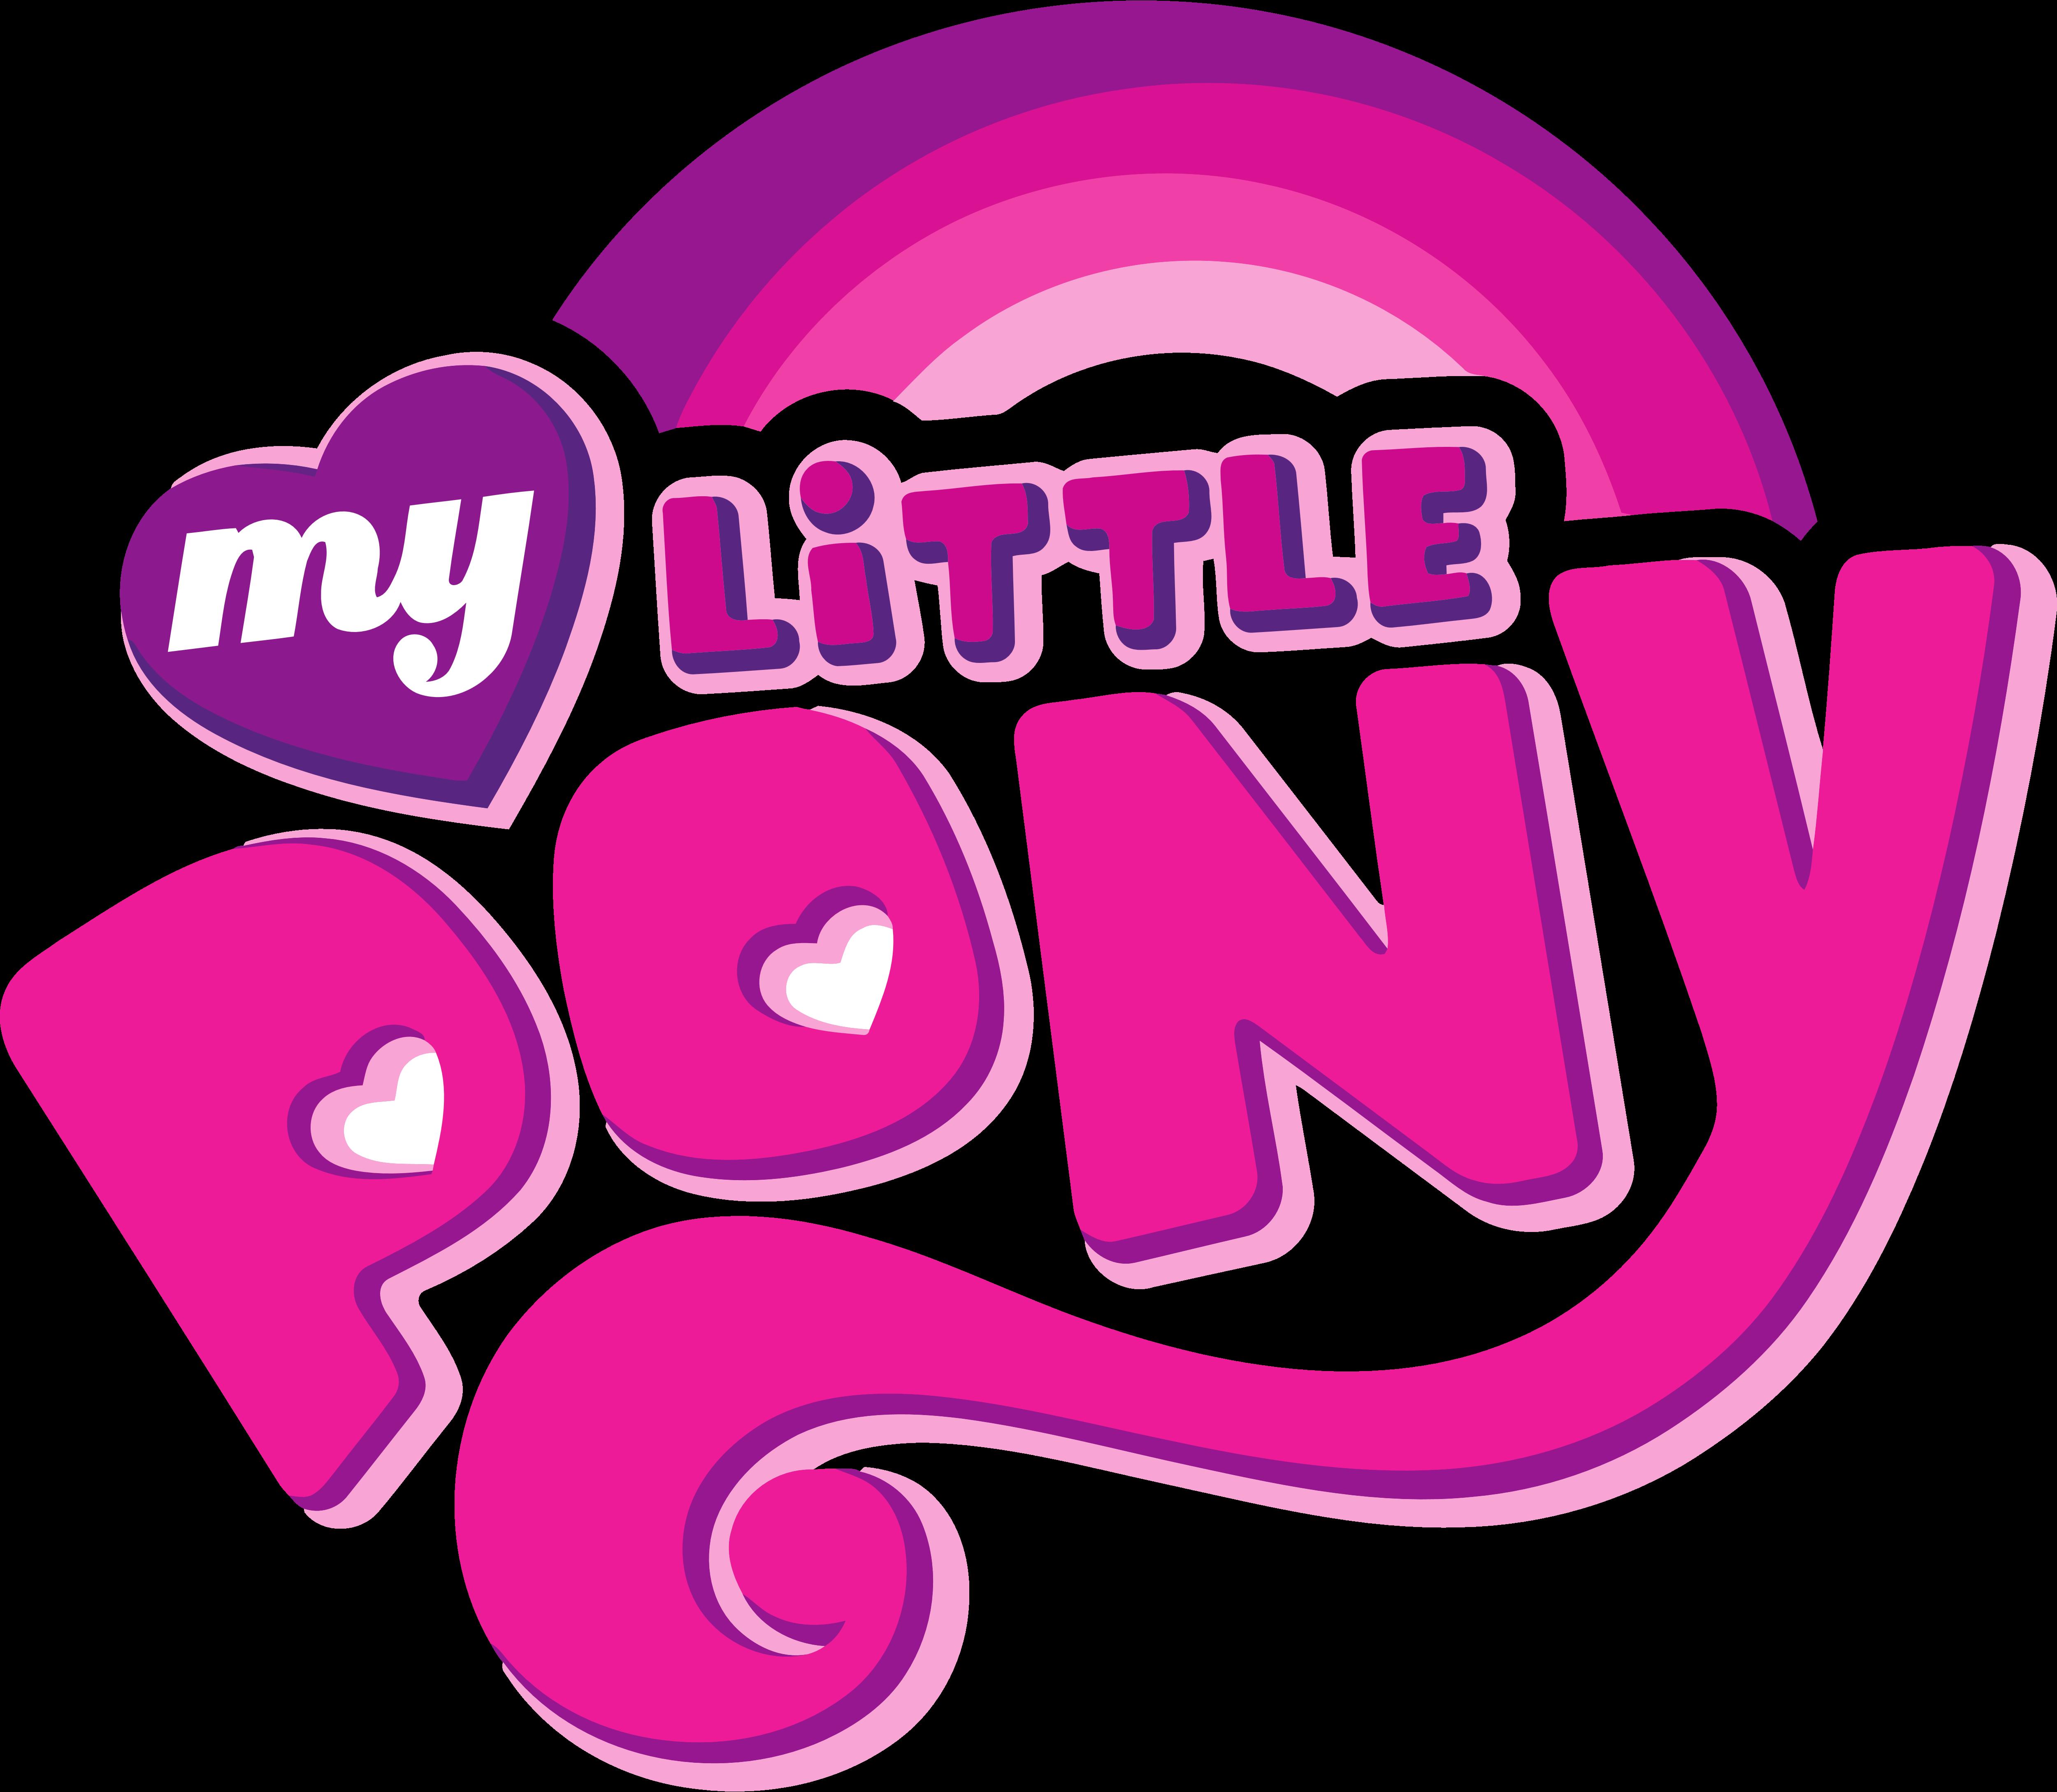 My Little Pony Friendship is Magic.